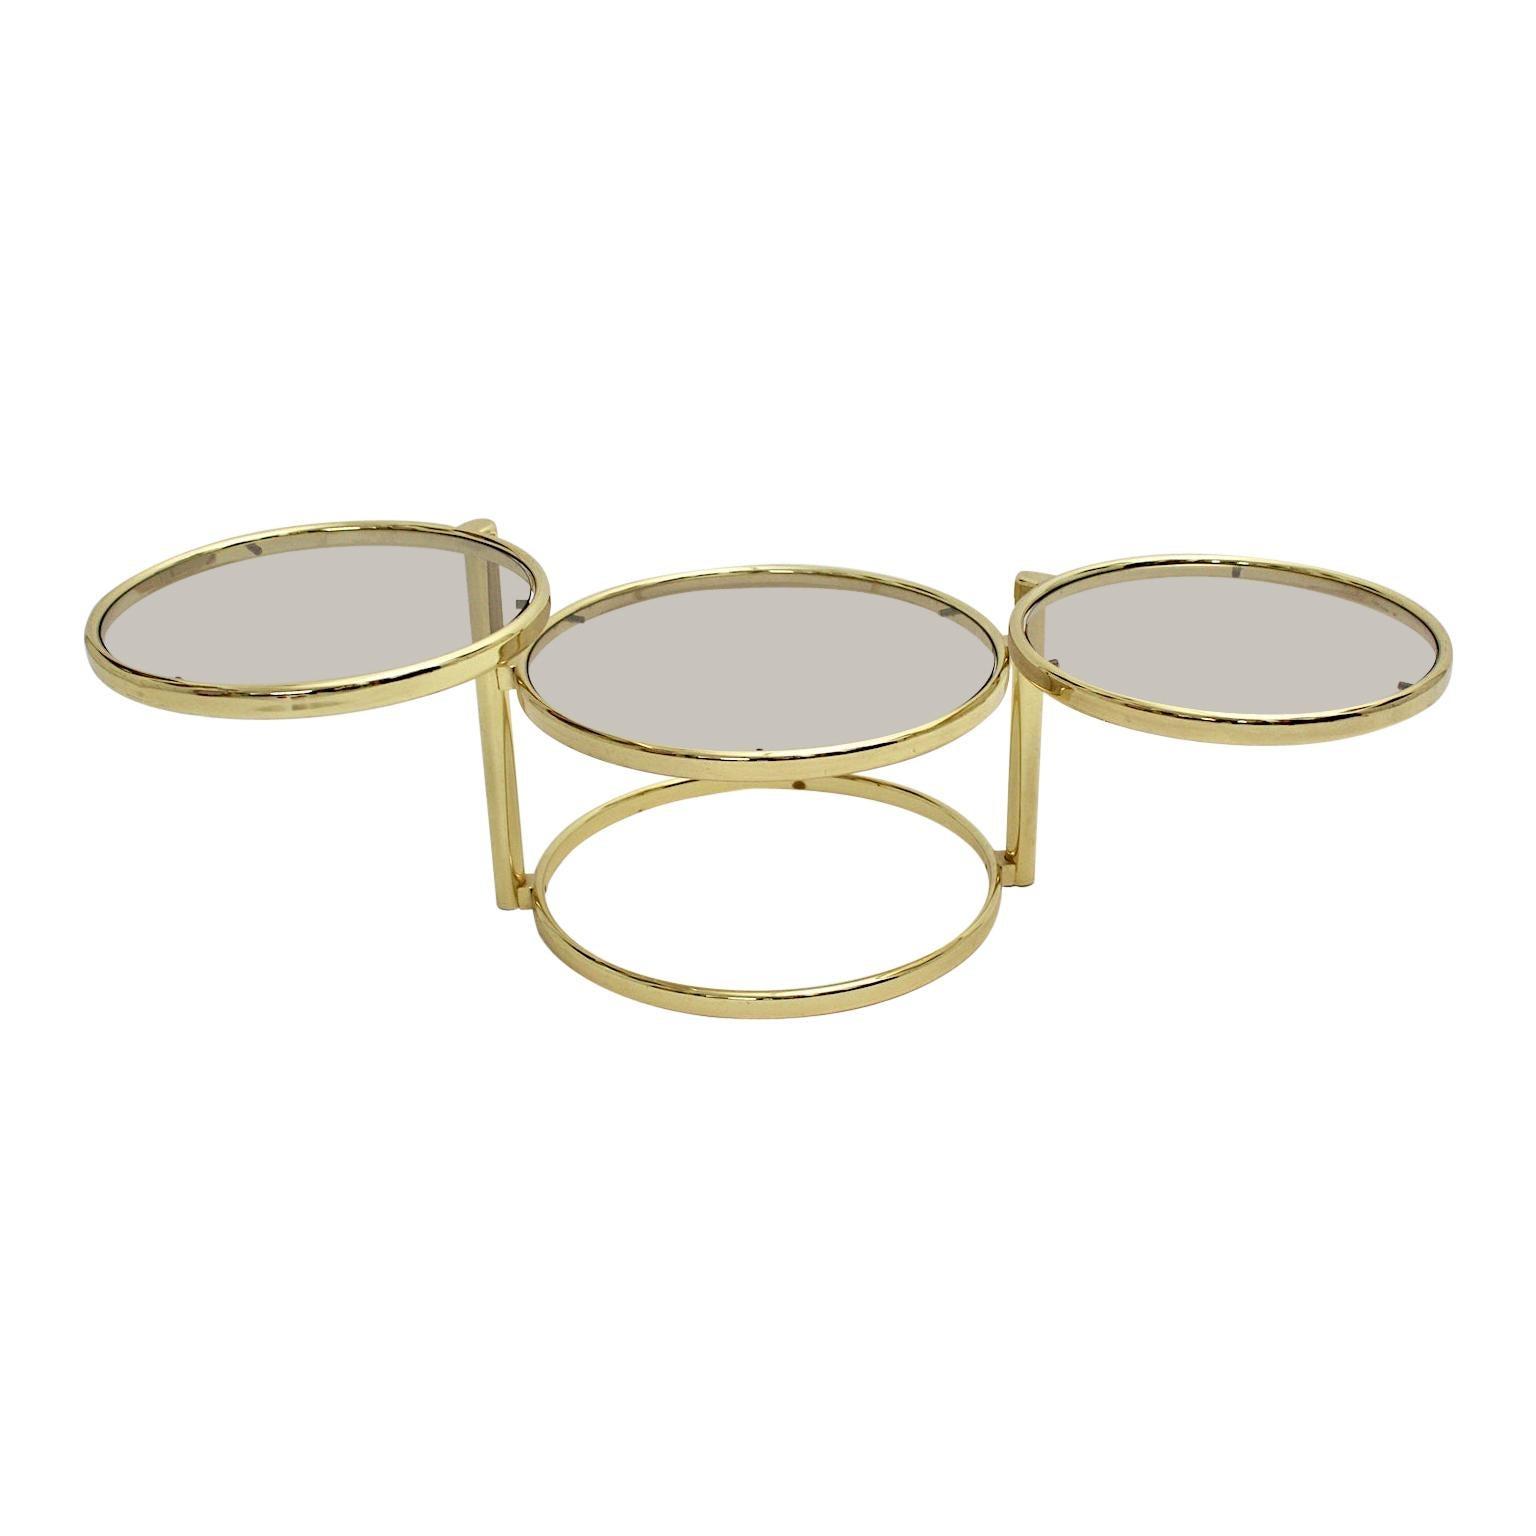 Mid-Century Modern Vintage Brassed Metal Glass Swiveling Coffee Table circa 1970